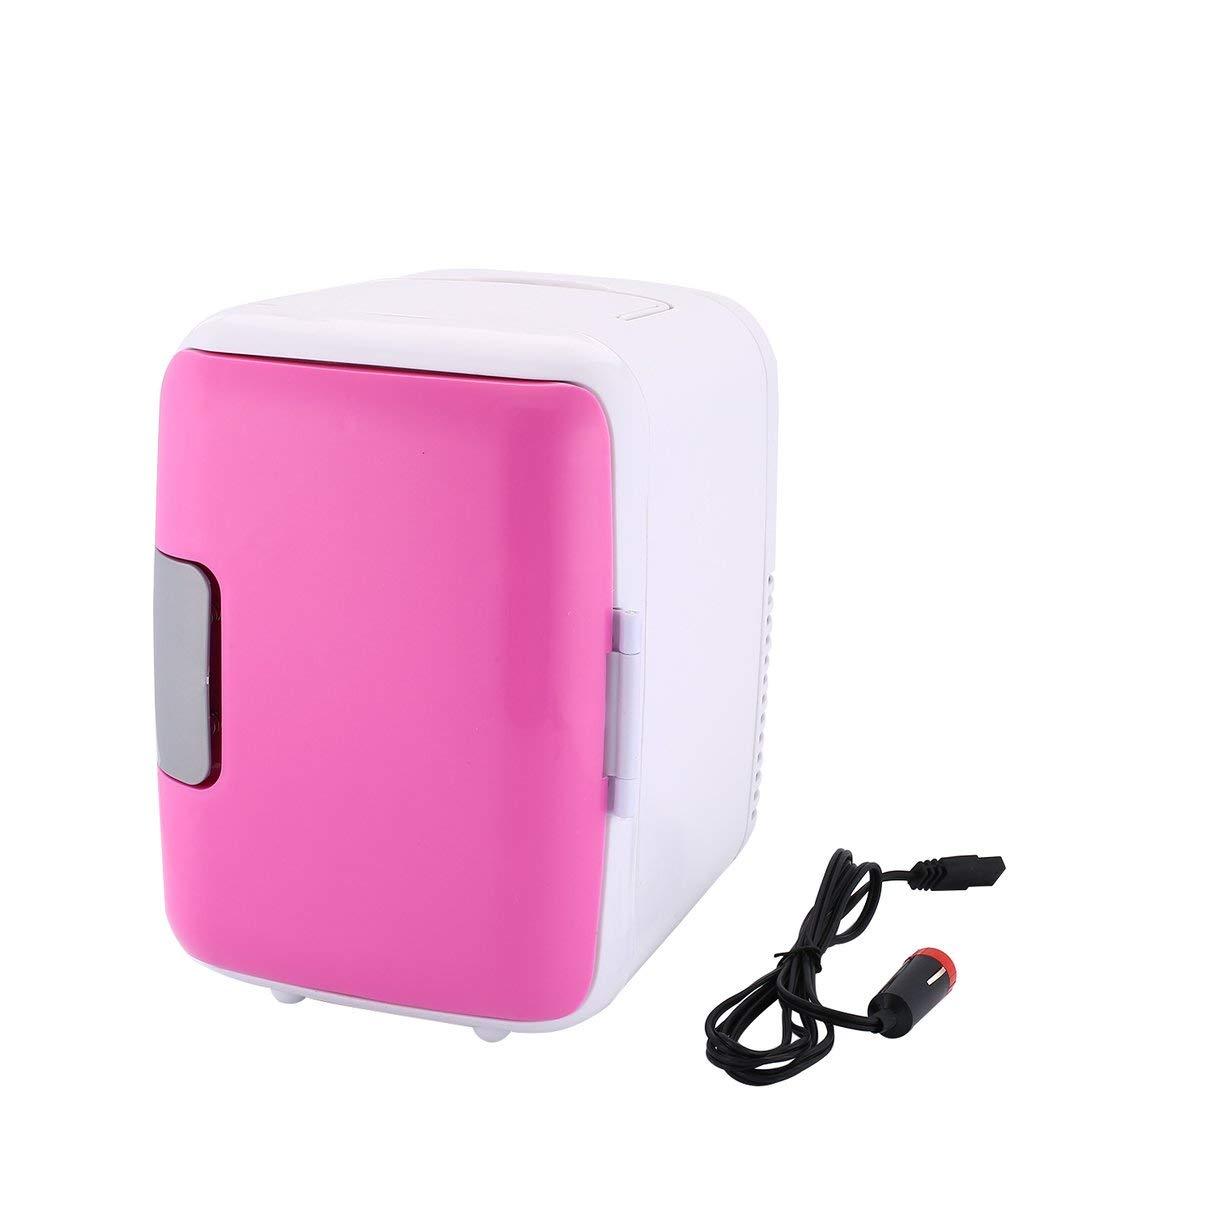 hydens Compact Size 4L Car Refrigerators Ultra Quiet Low Noise Car Mini Refrigerators Freezer Cooling Heating Box Fridge